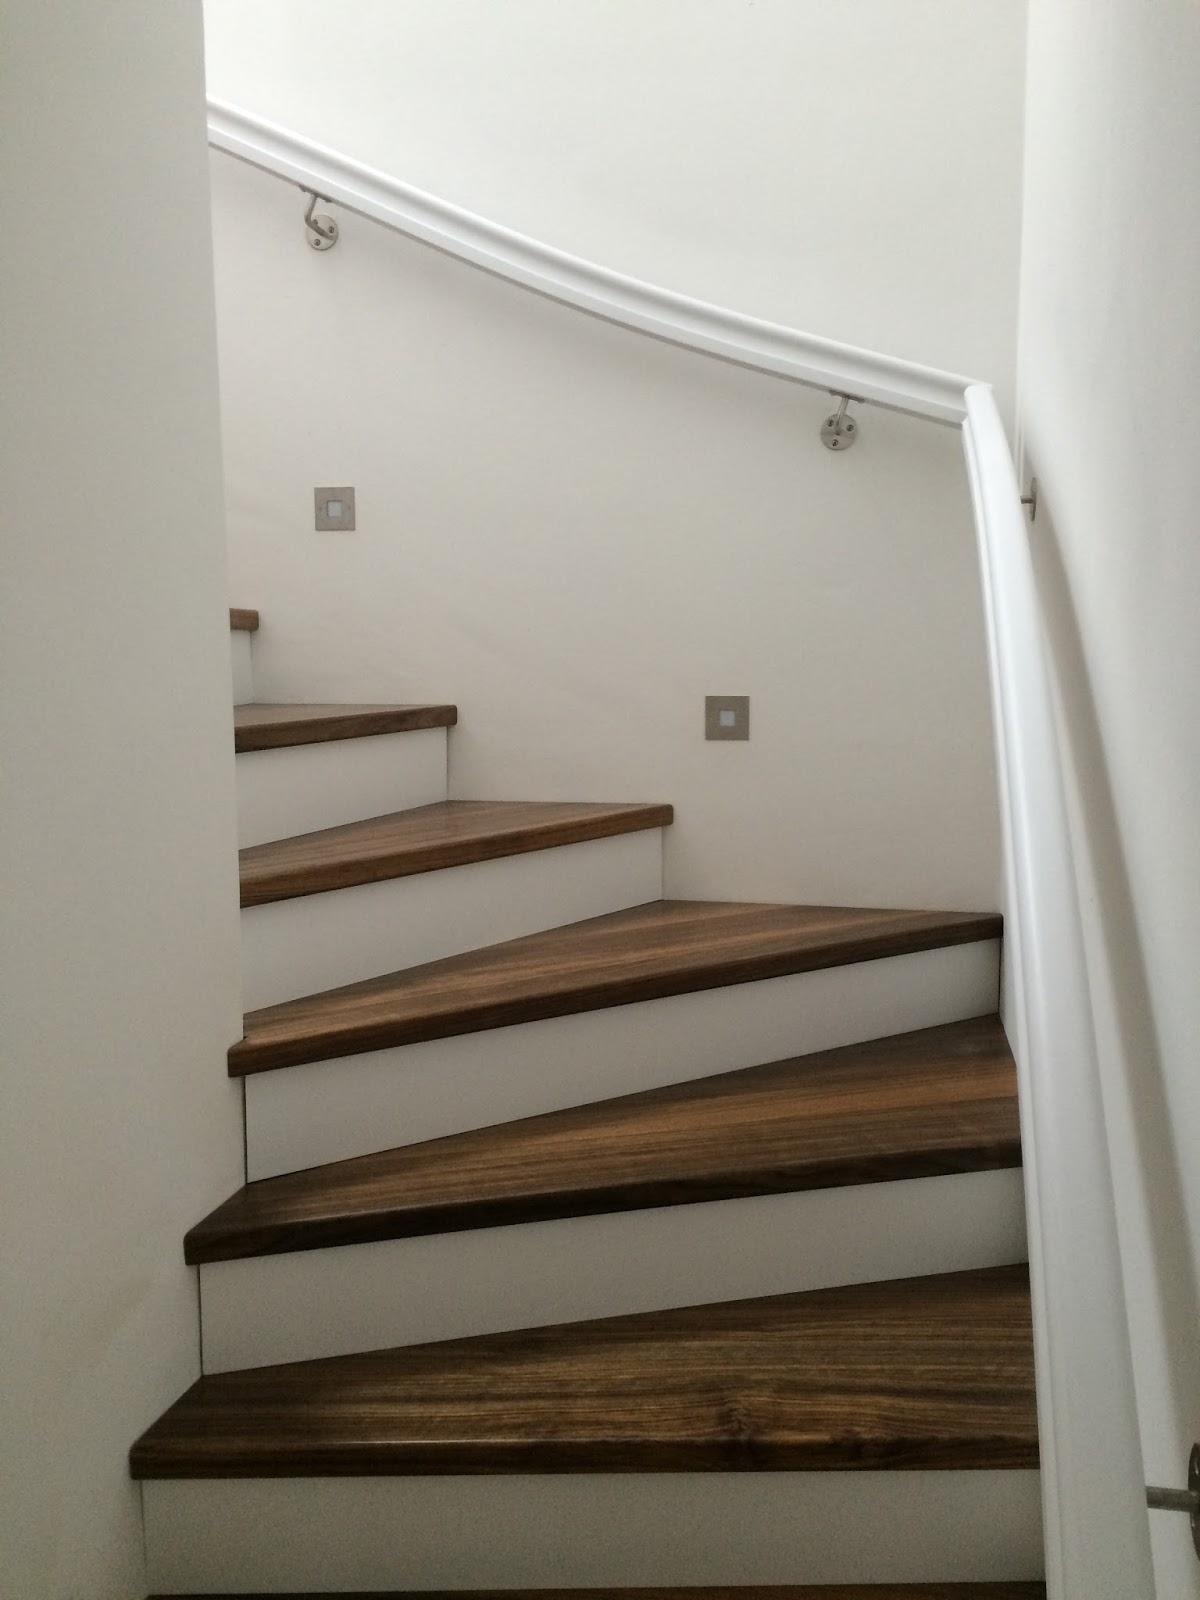 zuhause in rellingen treppenstufen und kamin. Black Bedroom Furniture Sets. Home Design Ideas